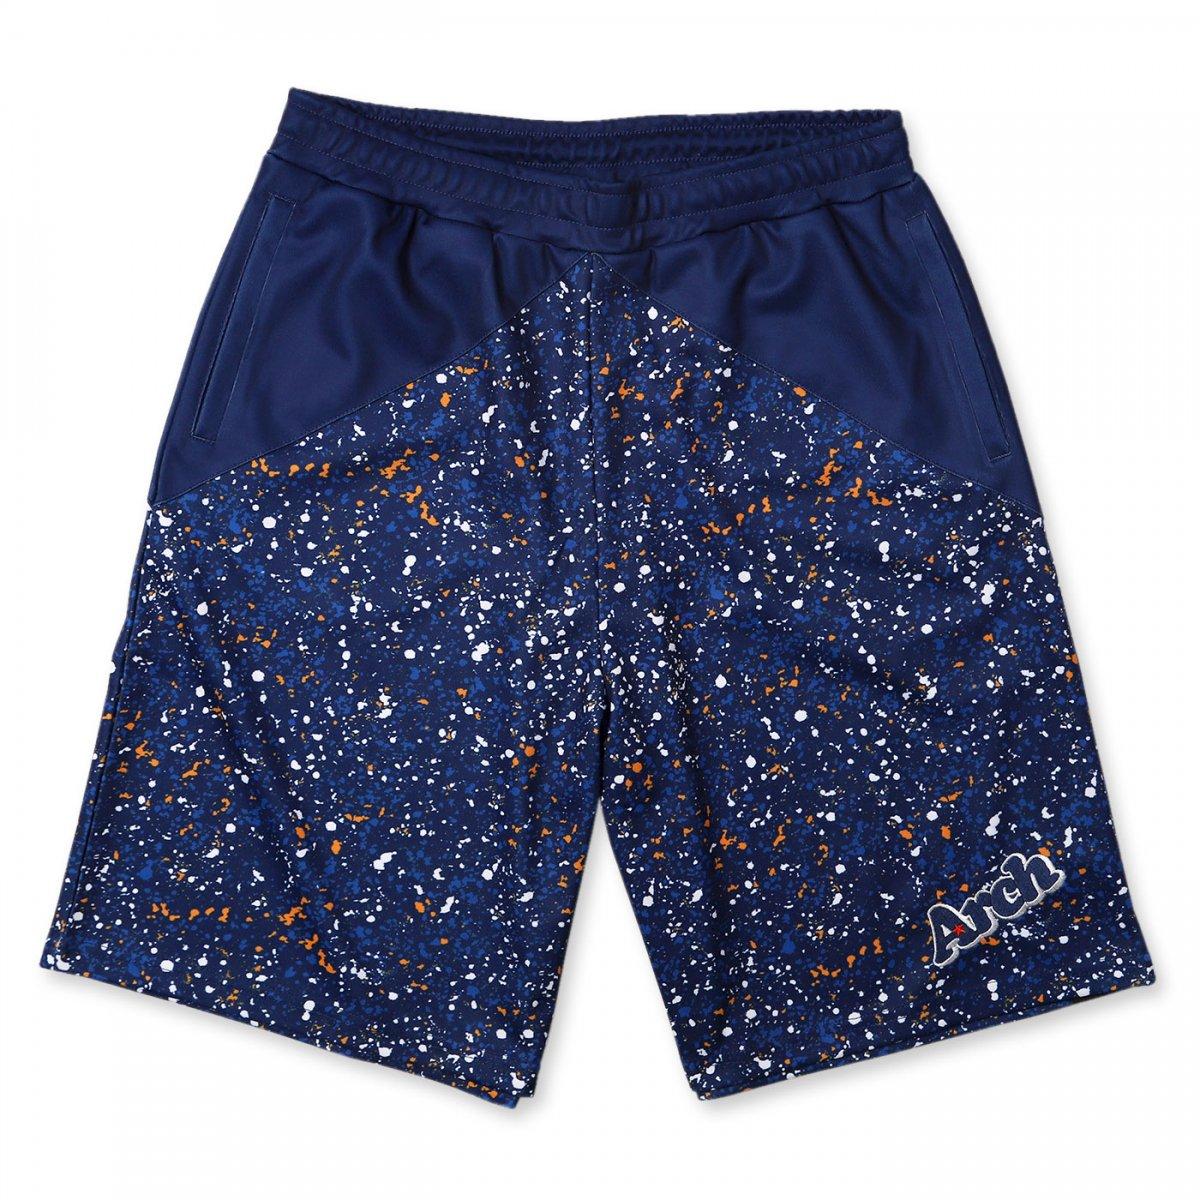 paint splatter shorts【blue】